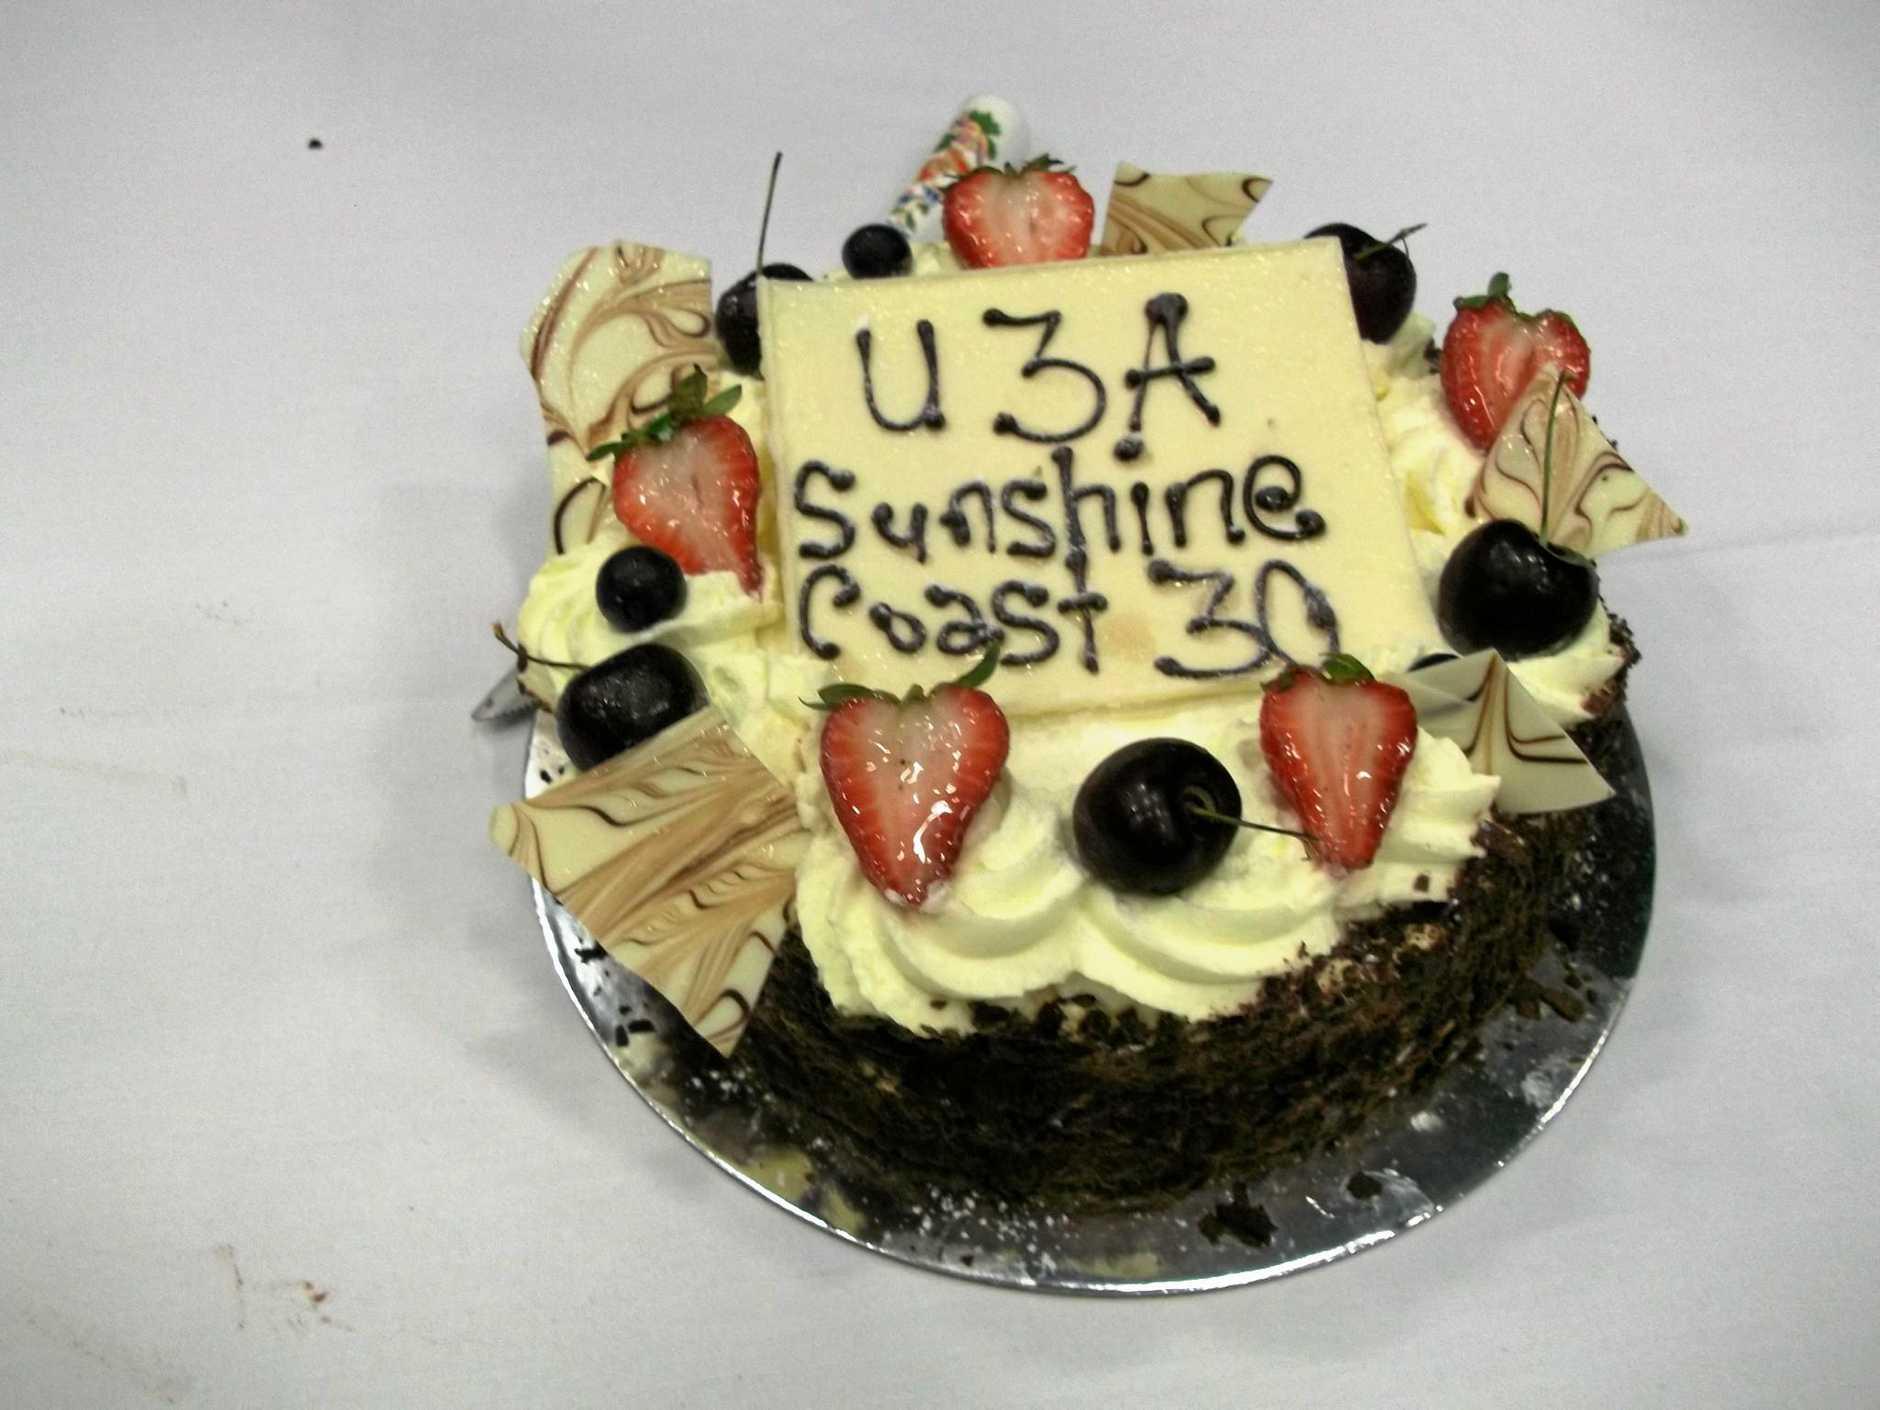 U3A Sunshine Coast's 30th anniversary.